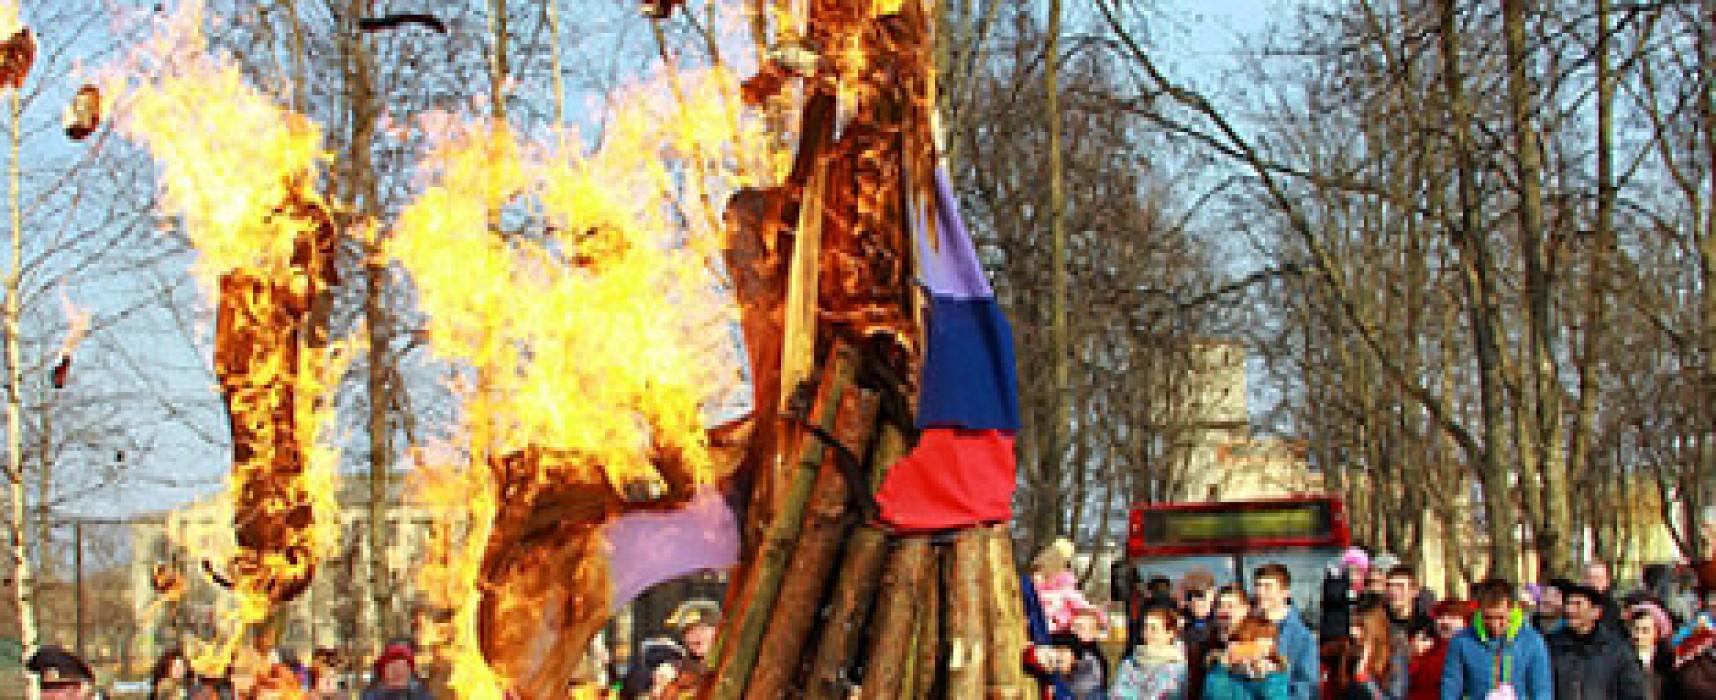 Fake: Russian Flag Burned in Belarus